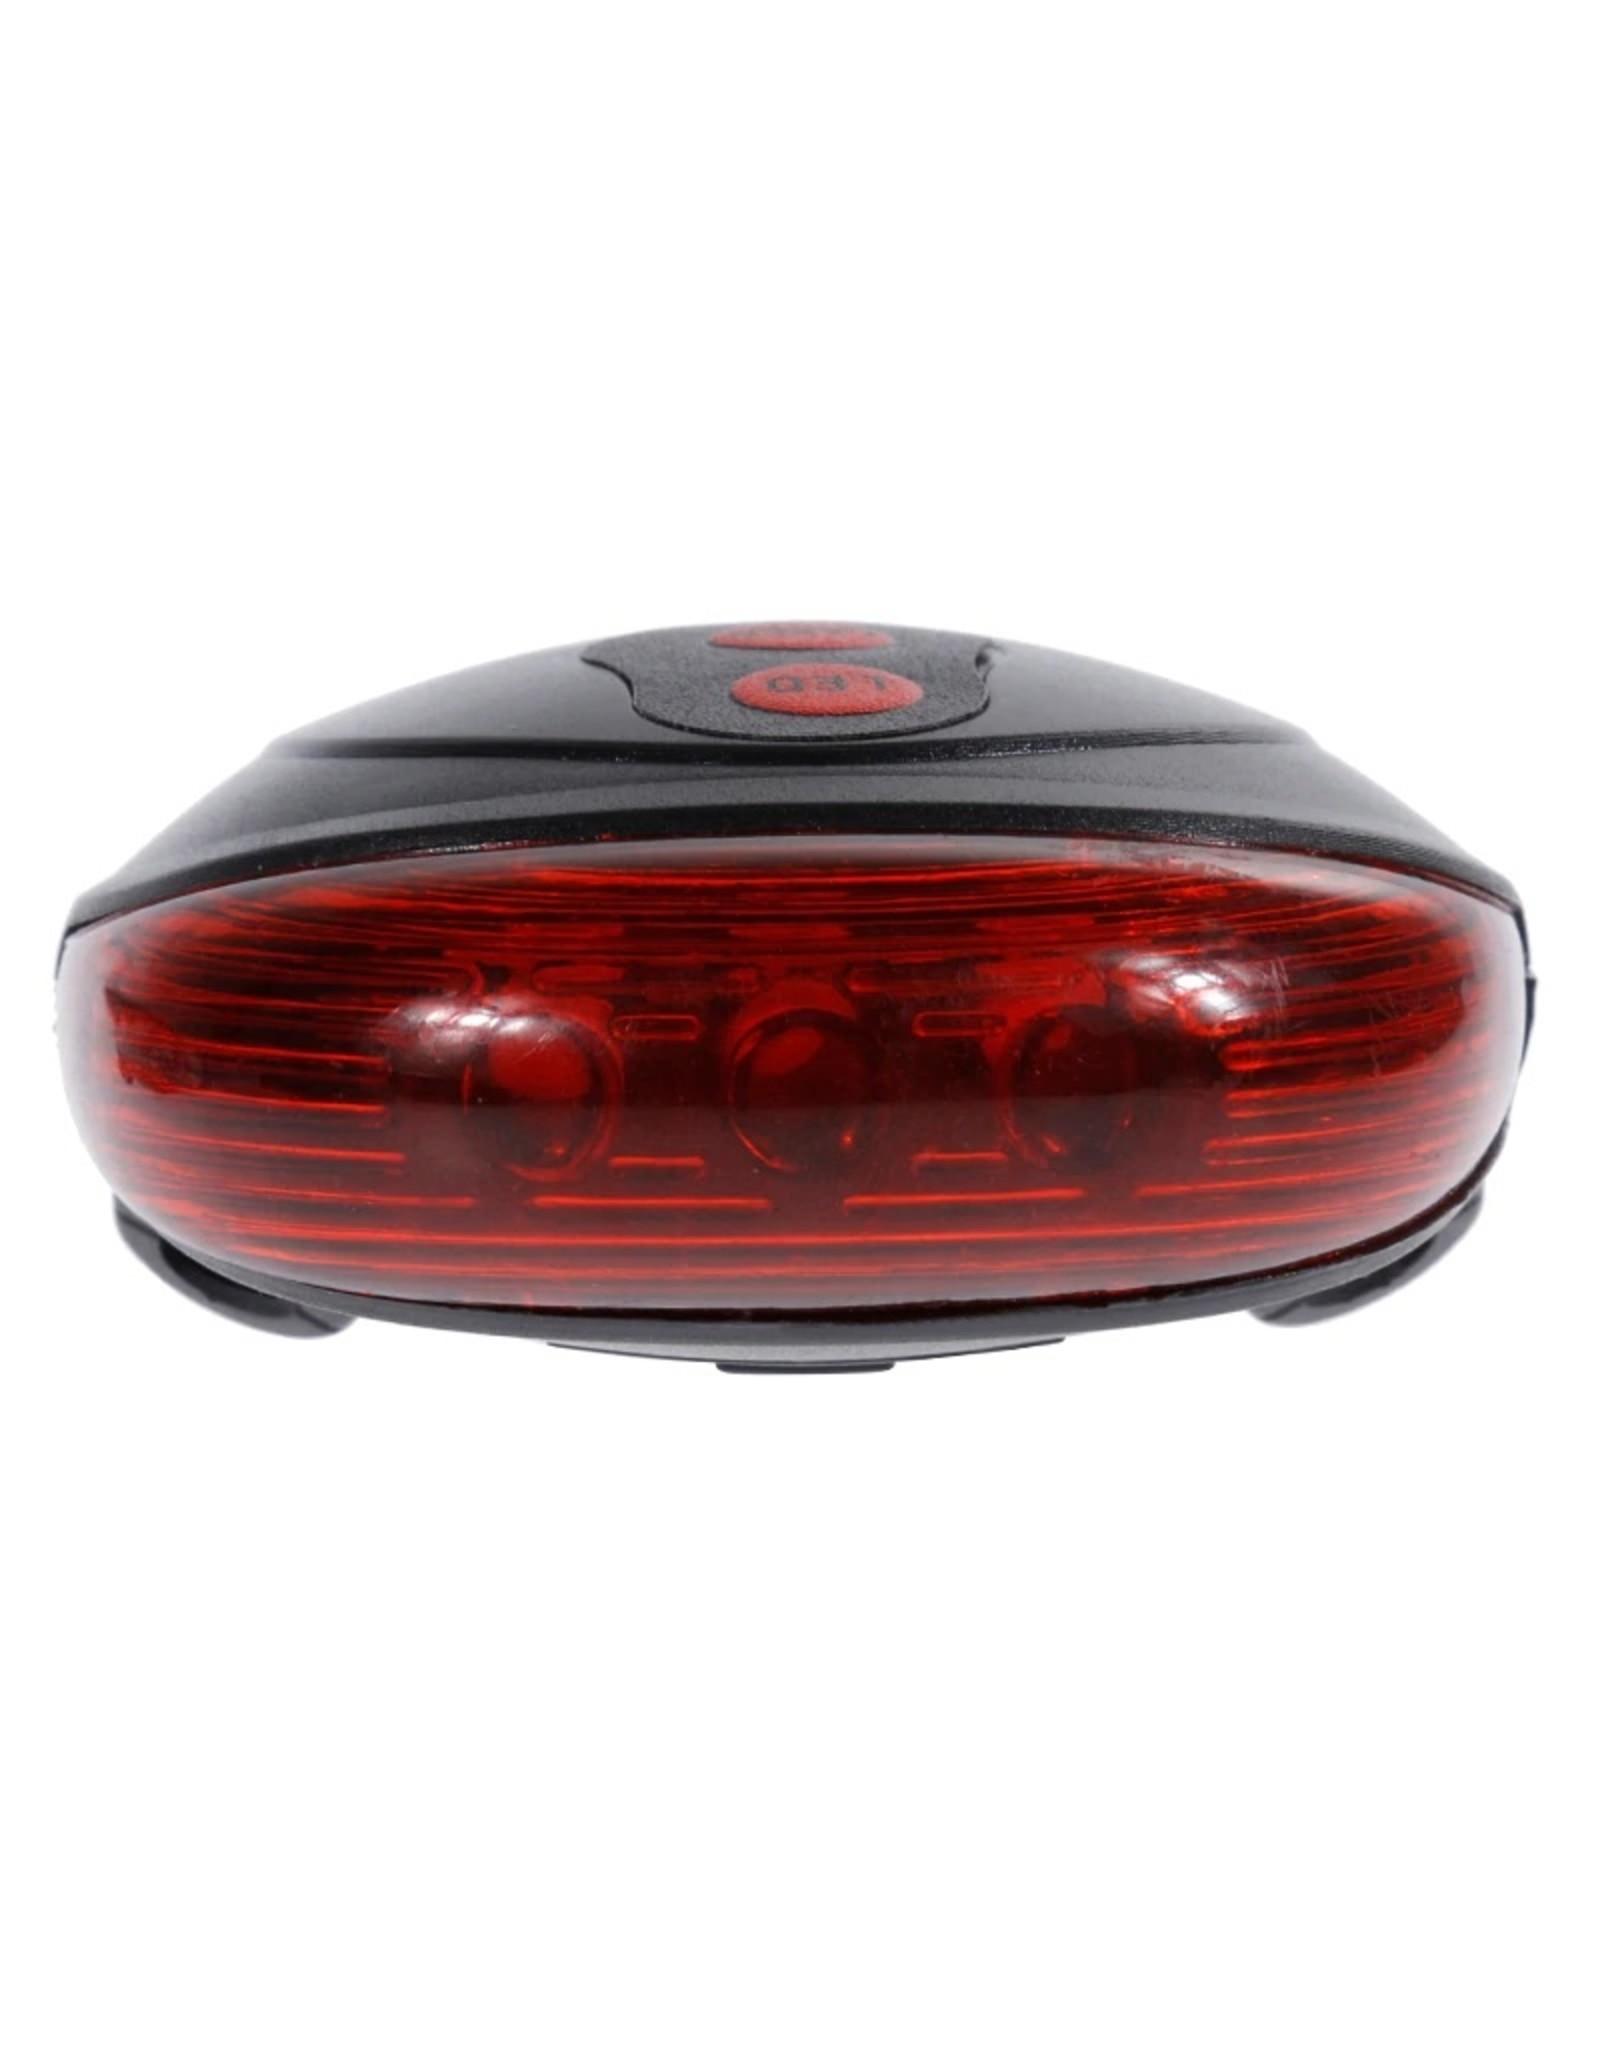 Laser fietslamp - LED verlichting fiets - Achterlicht fiets - Afneembare fietslamp - Fietsverlichting (Rood)